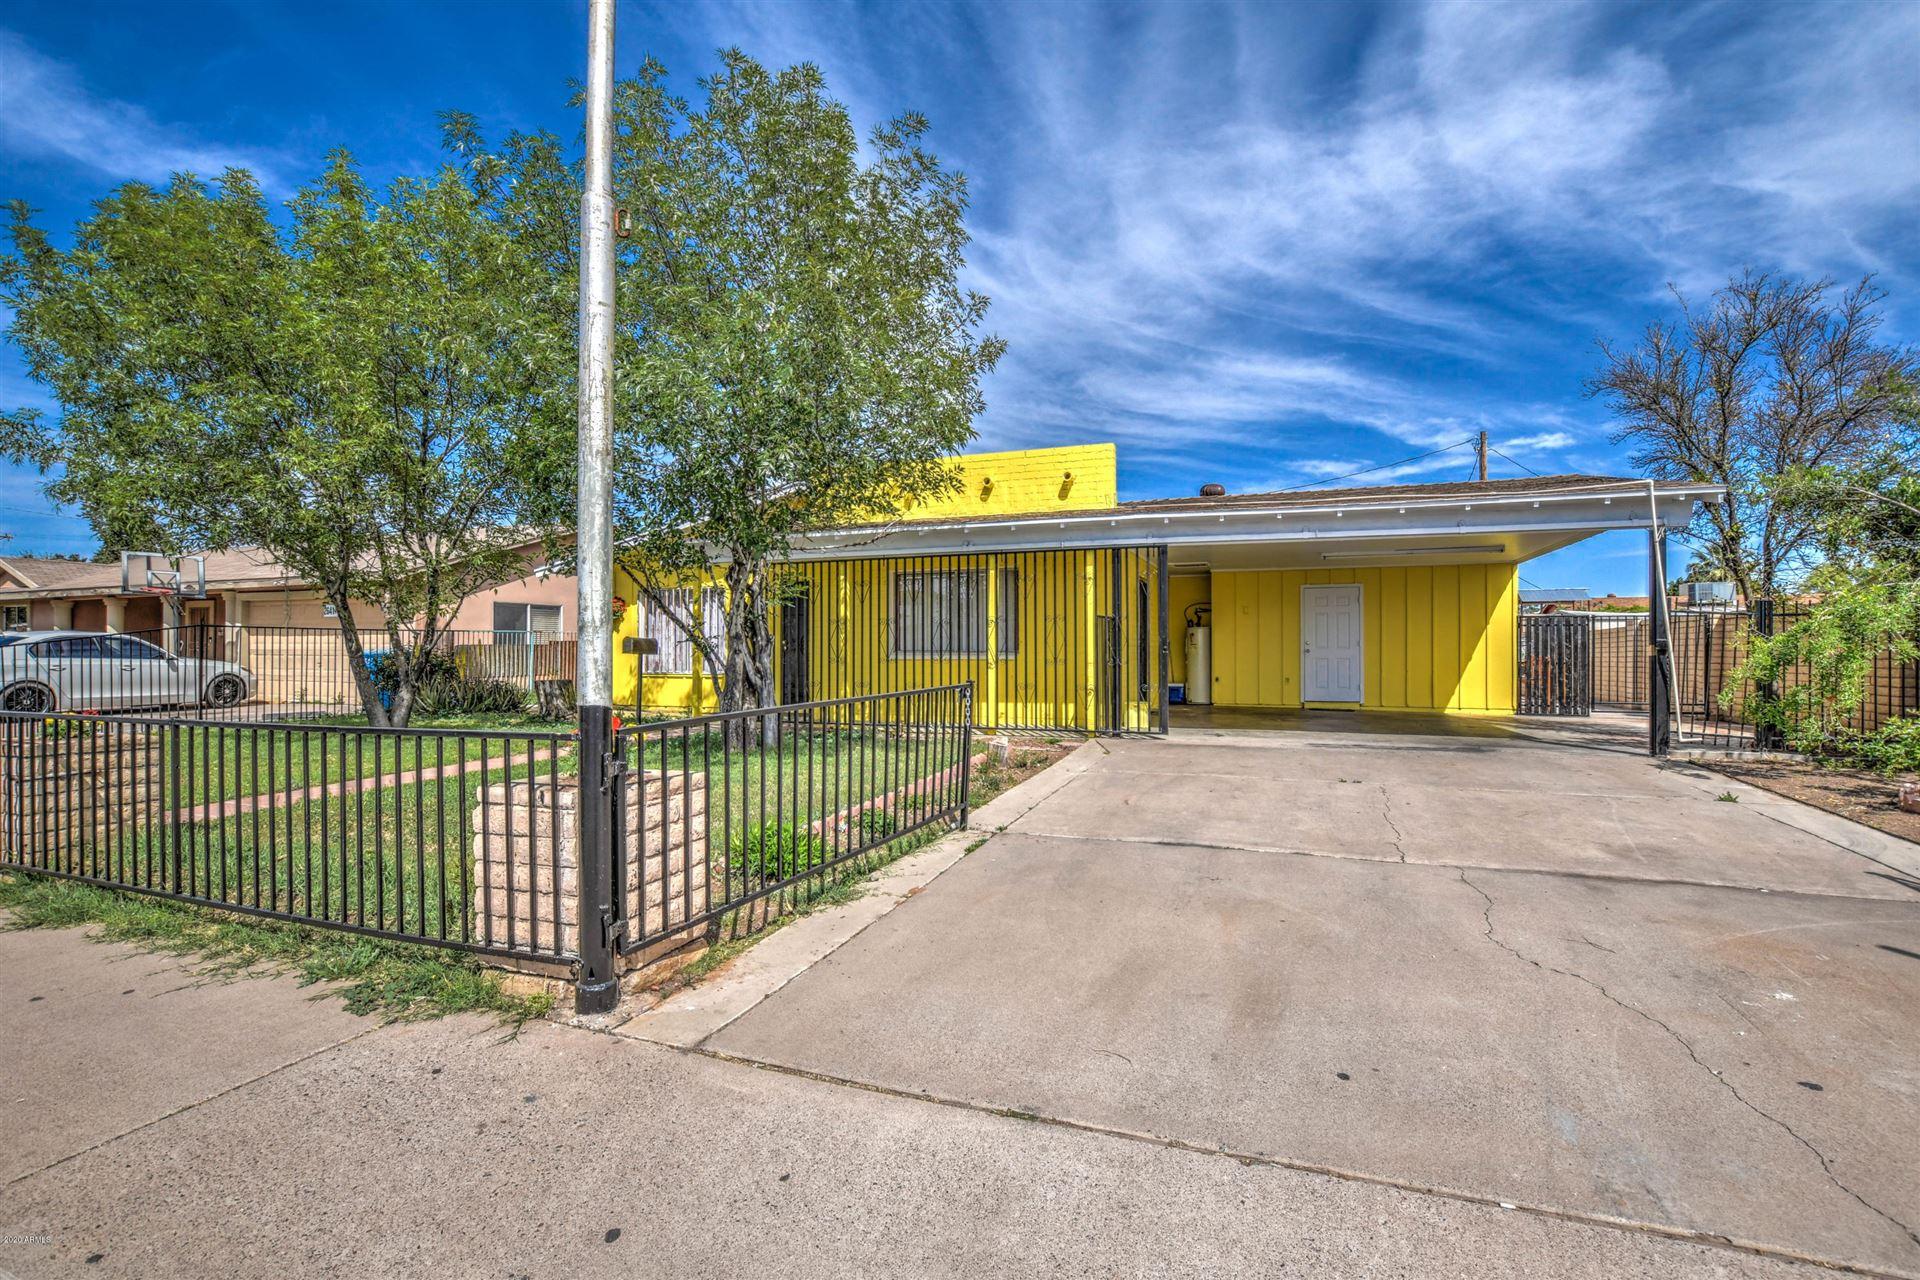 2635 N 55TH Avenue, Phoenix, AZ 85035 - MLS#: 6066133